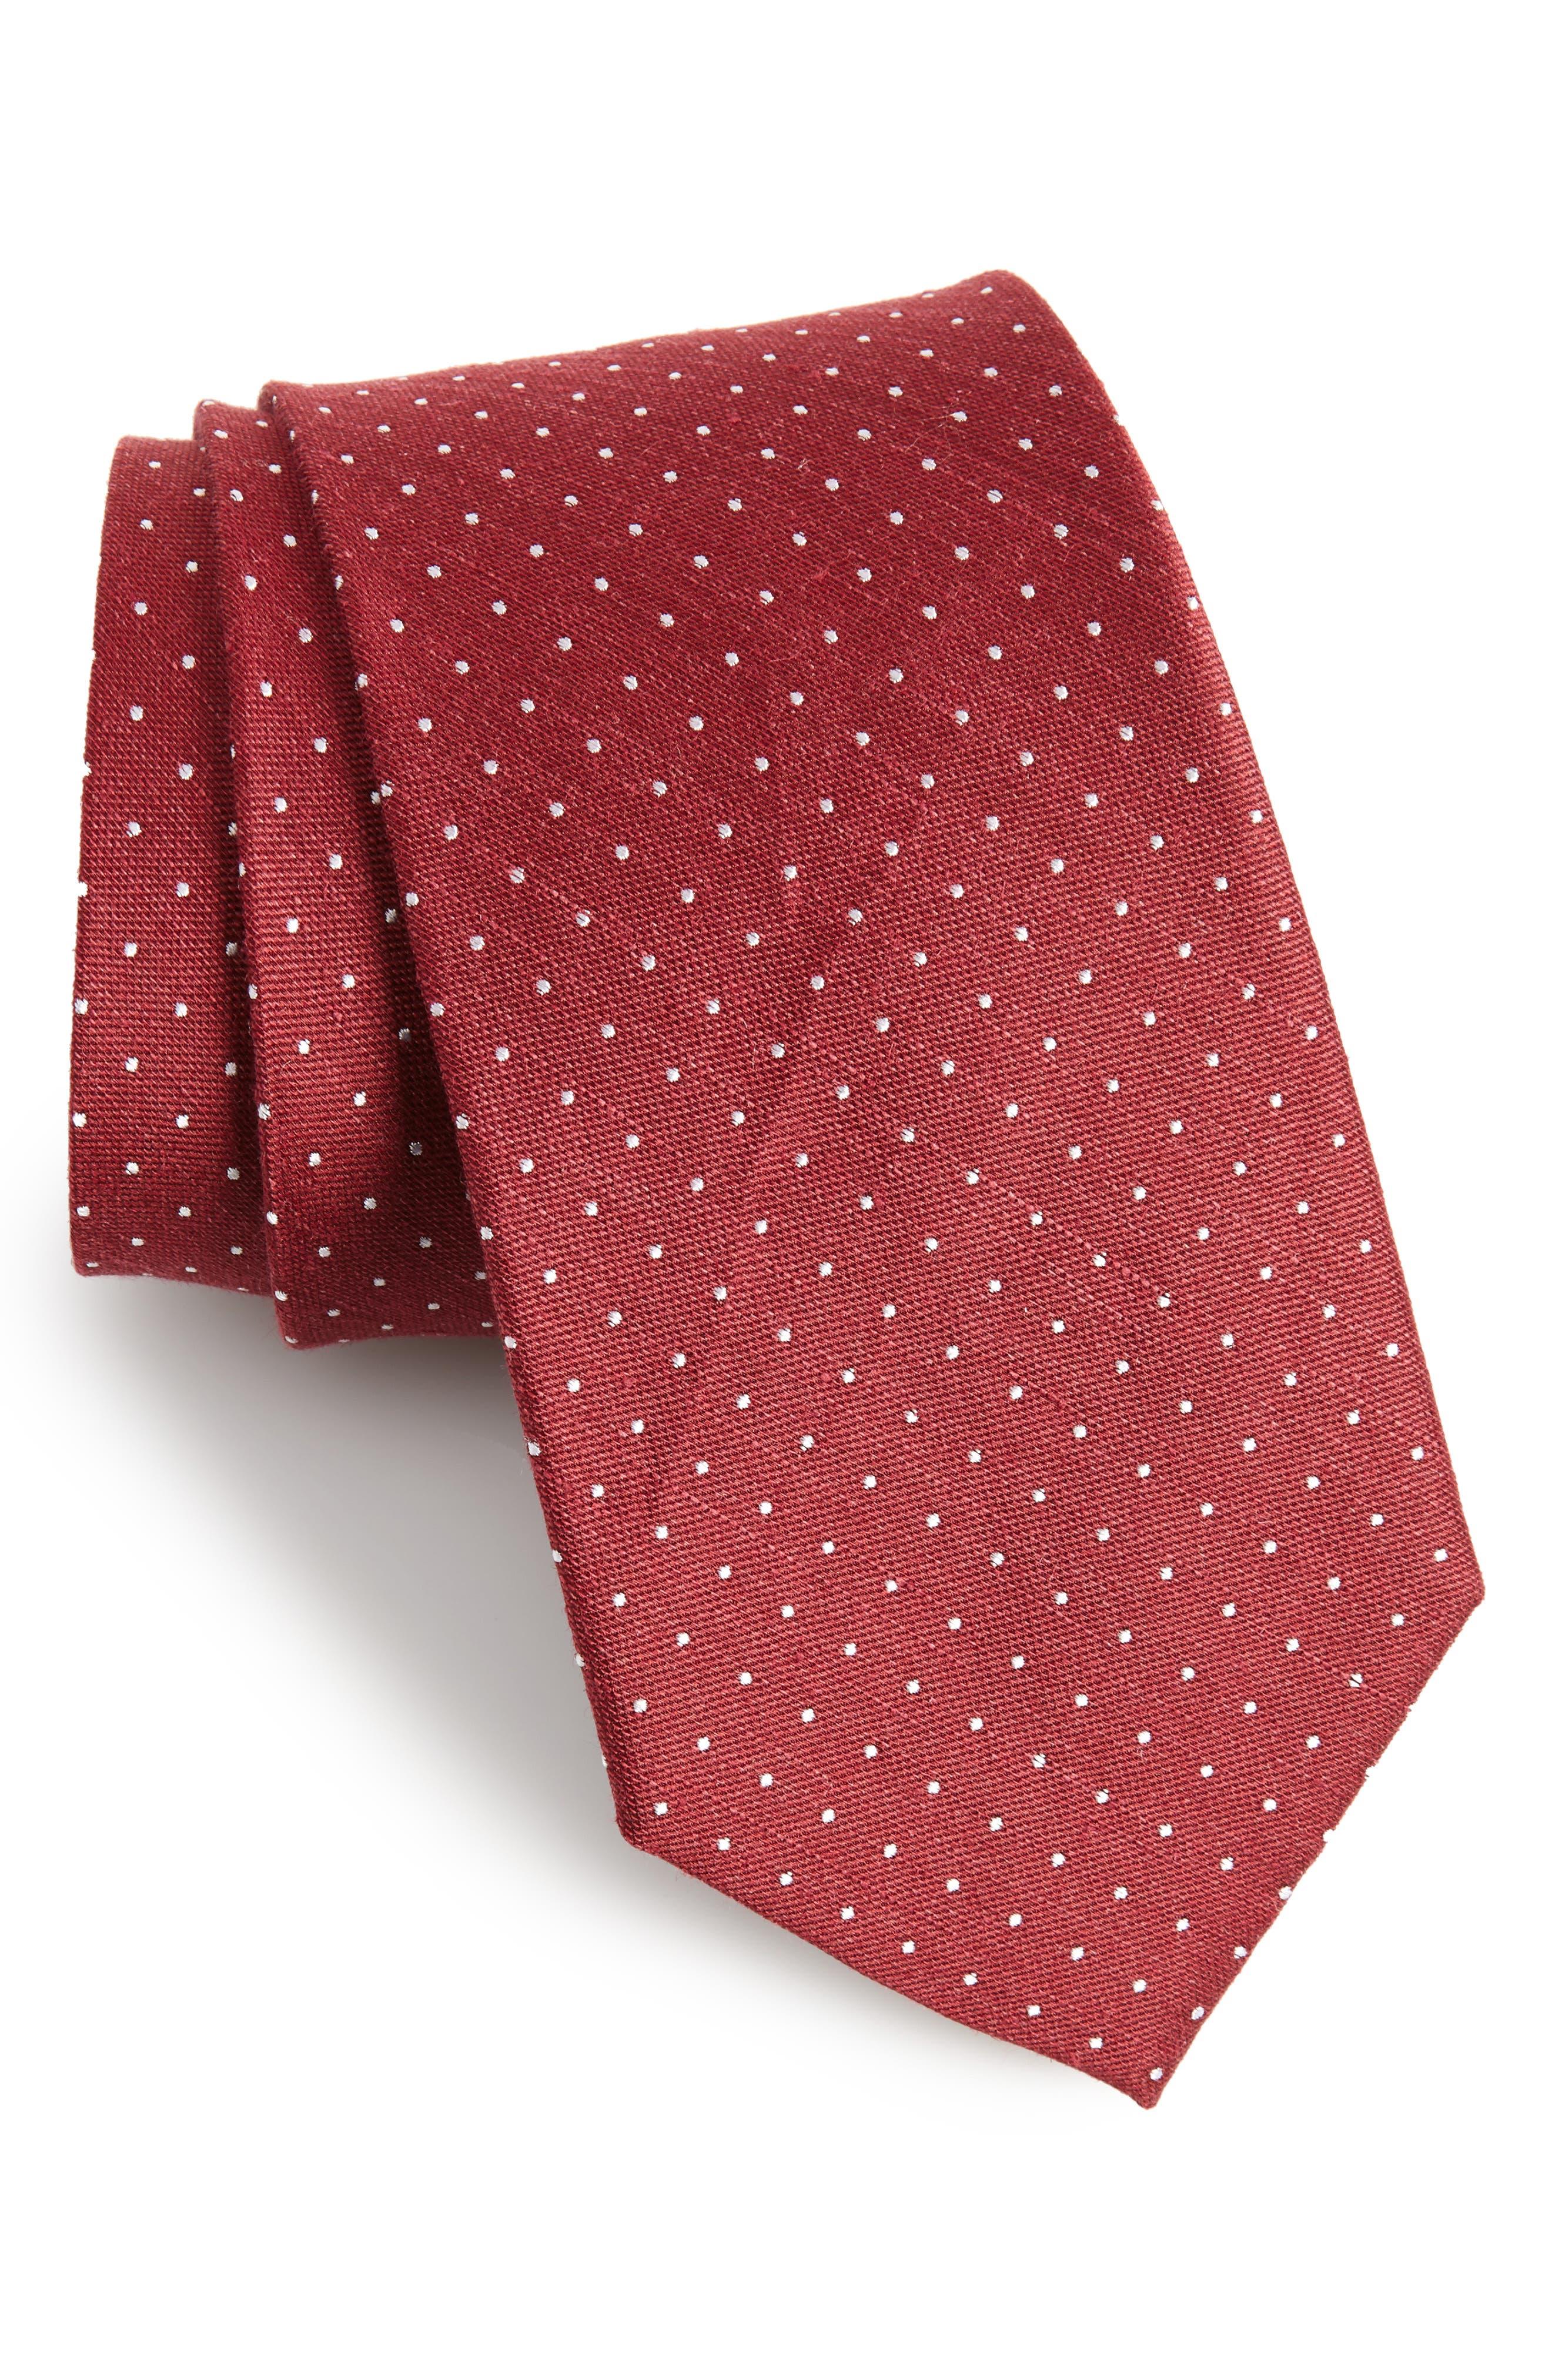 Alternate Image 1 Selected - The Tie Bar Dot Silk & Linen Tie (X-Long)